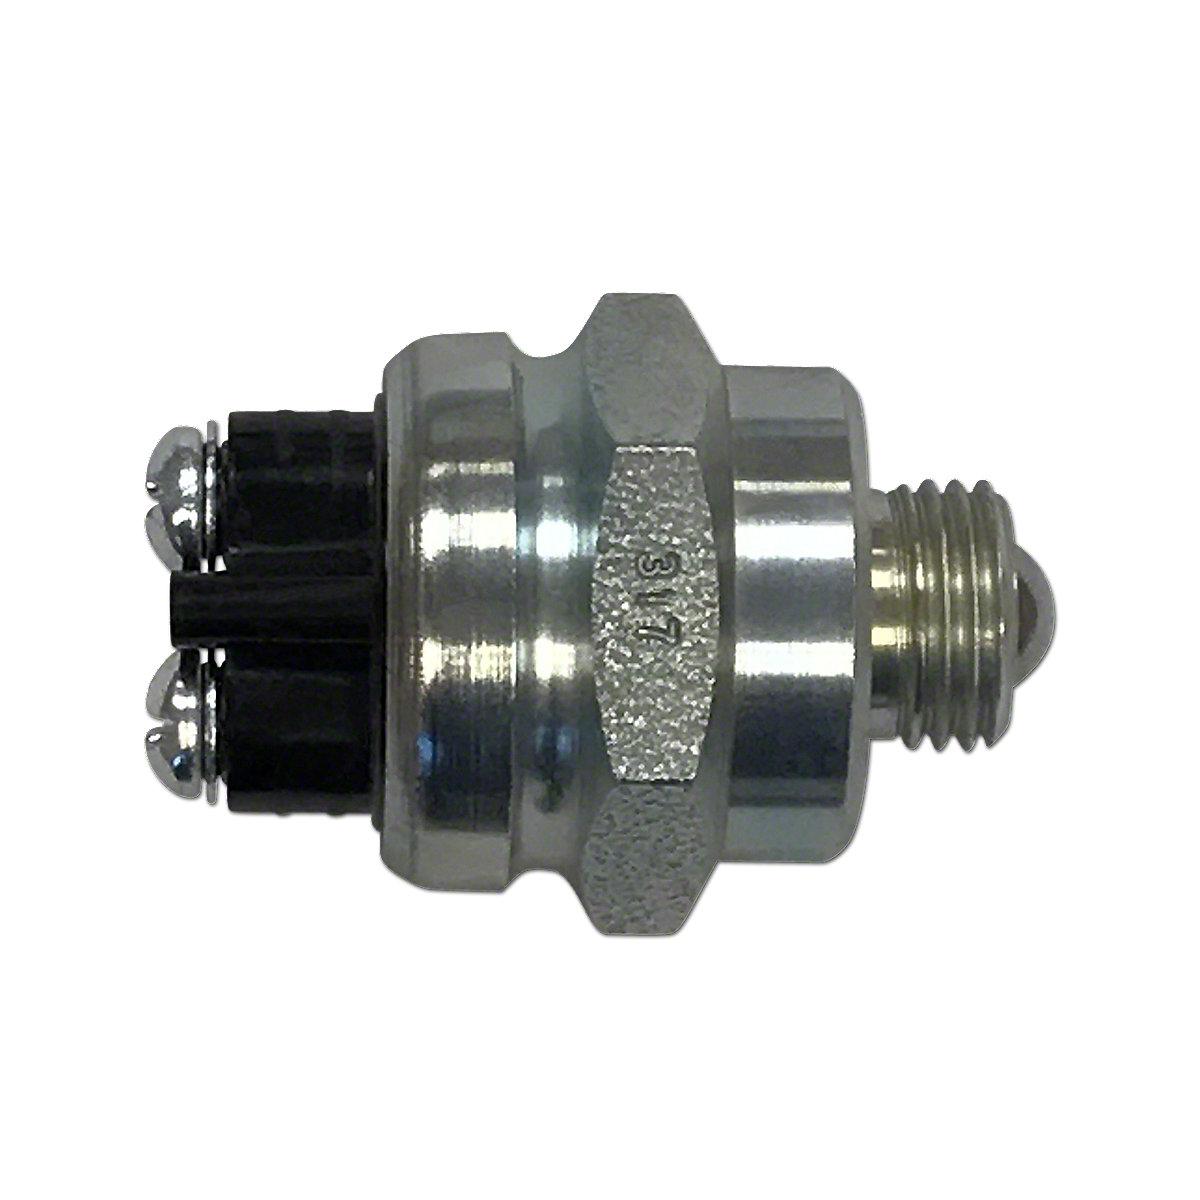 ABC3967Neutral Safety Starter Switch (OEM)